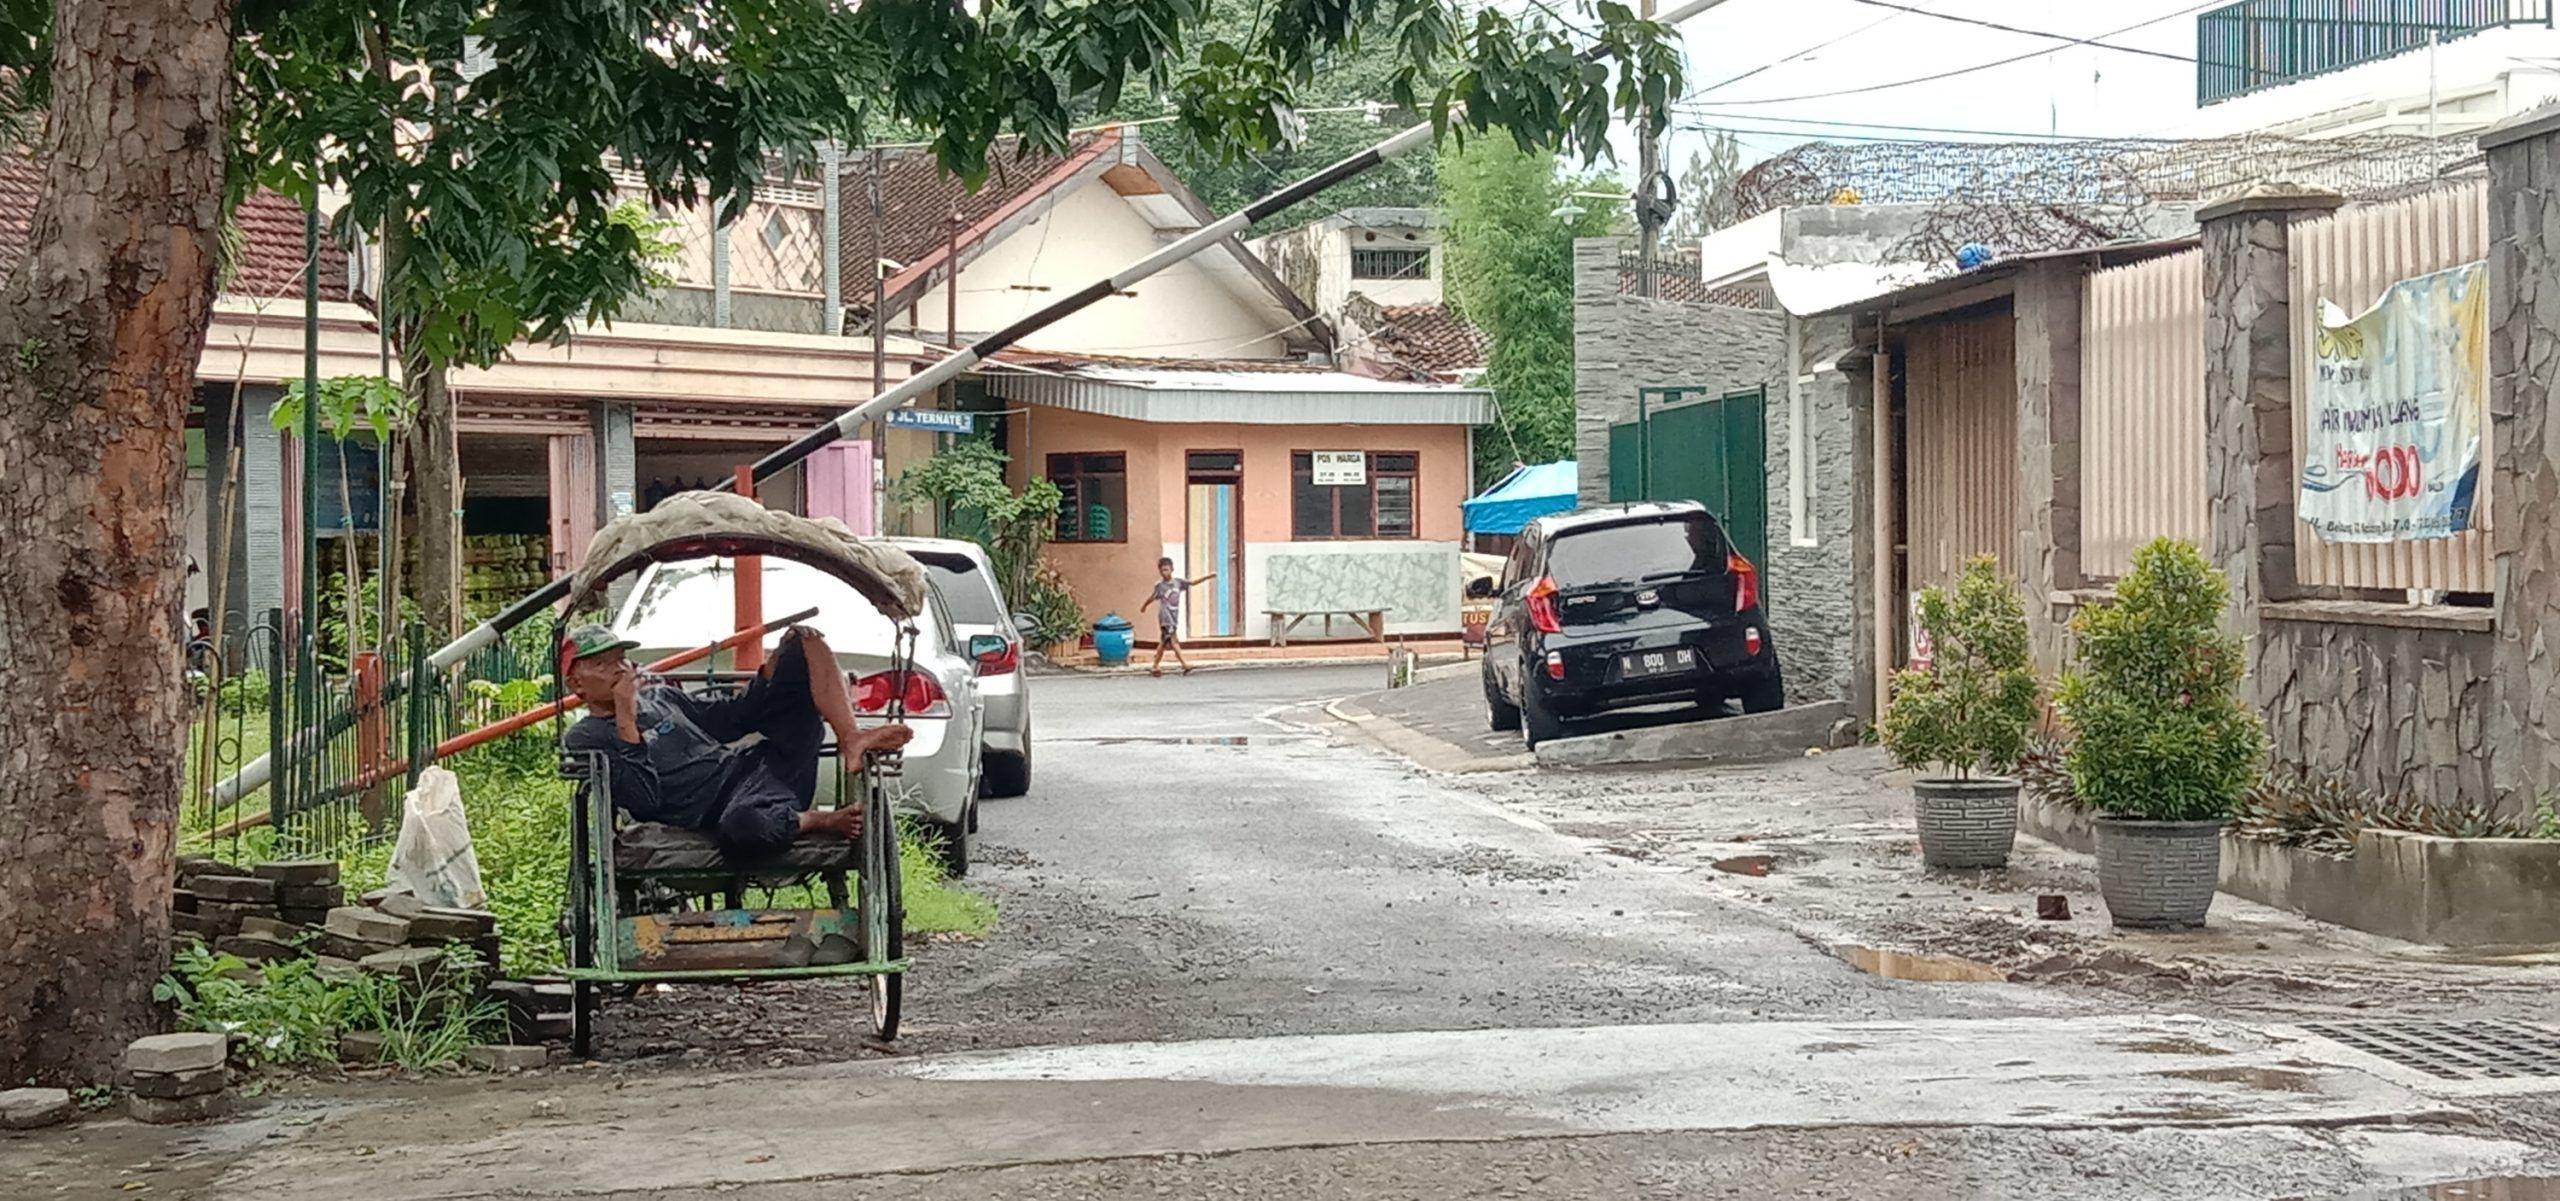 Ilustrasi kemisikinan di Kota Malang dampak pandemi COVID-19. (Foto: Fen/Tugu Malang/Tugu Jatim)